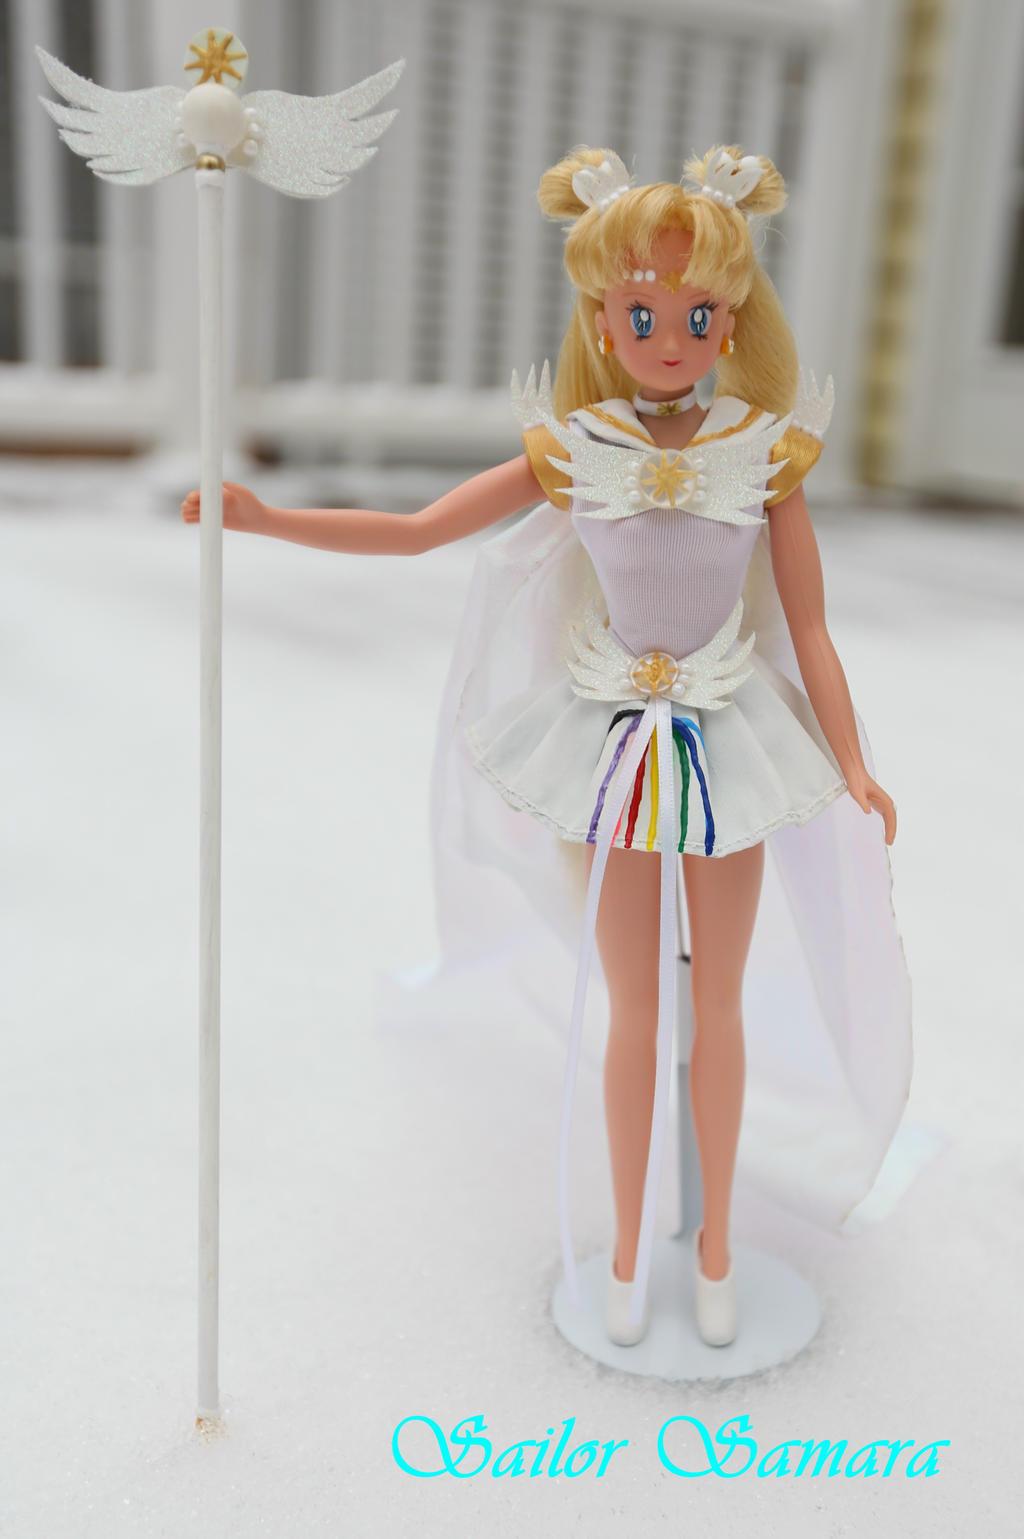 sailor cosmos from sailor moon stars custom doll by sailorsamara